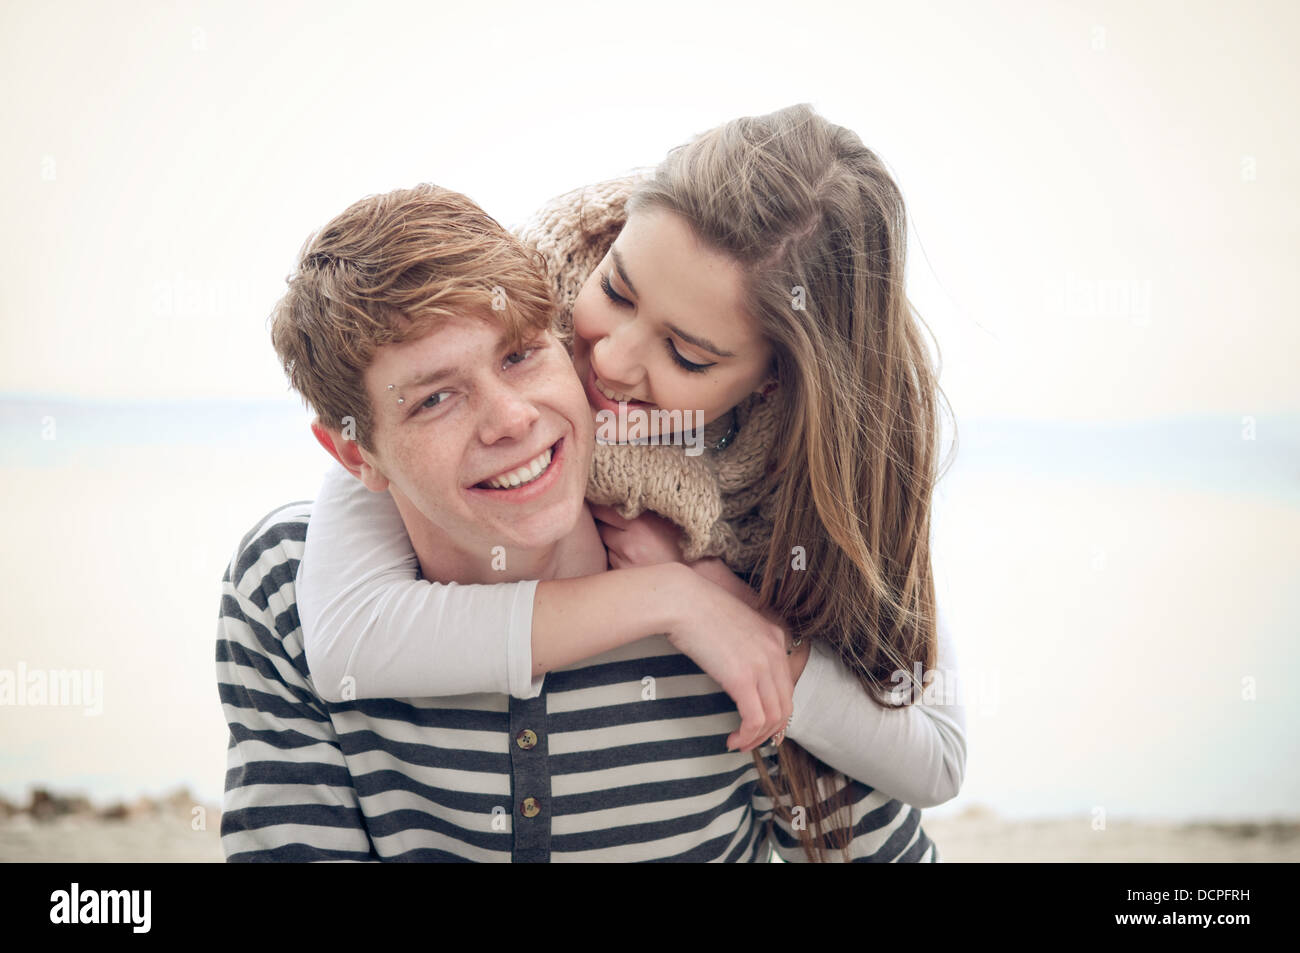 Happy teenage couple in love - Stock Image